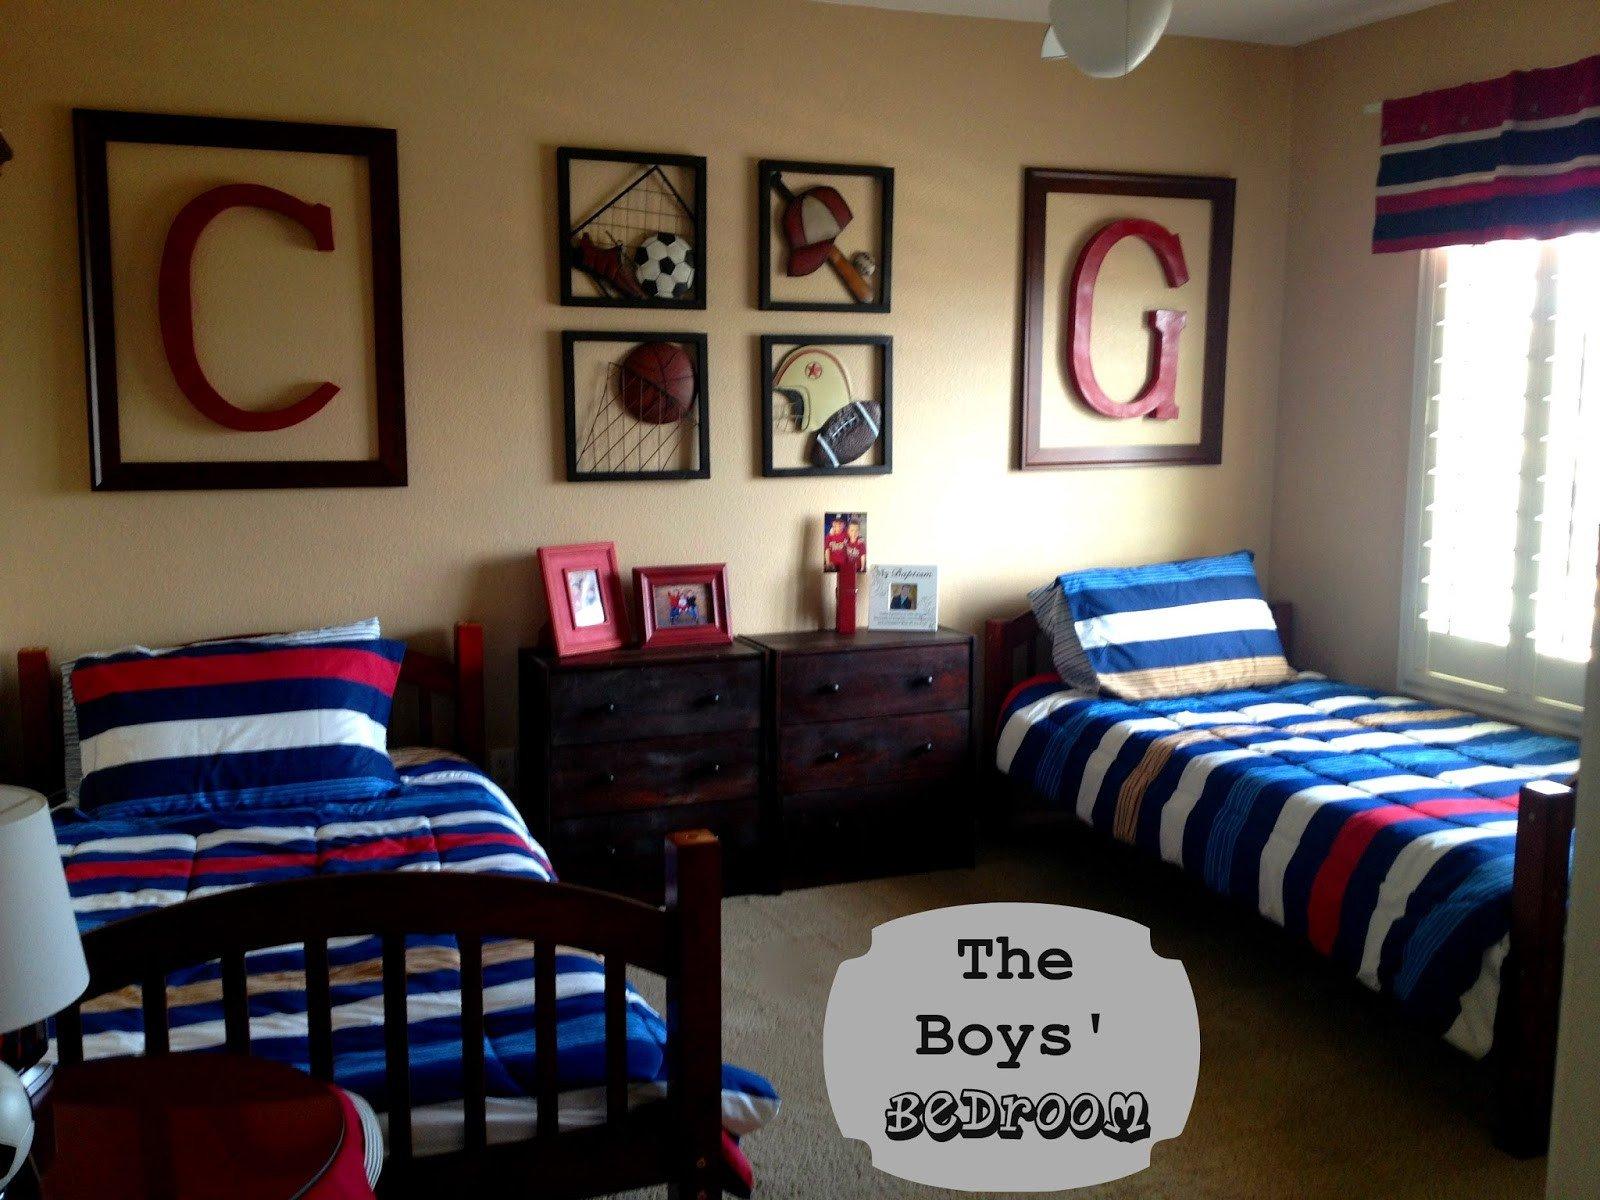 Room Decor Ideas for Boys New Marci Coombs the Boys Sports themed Bedroom